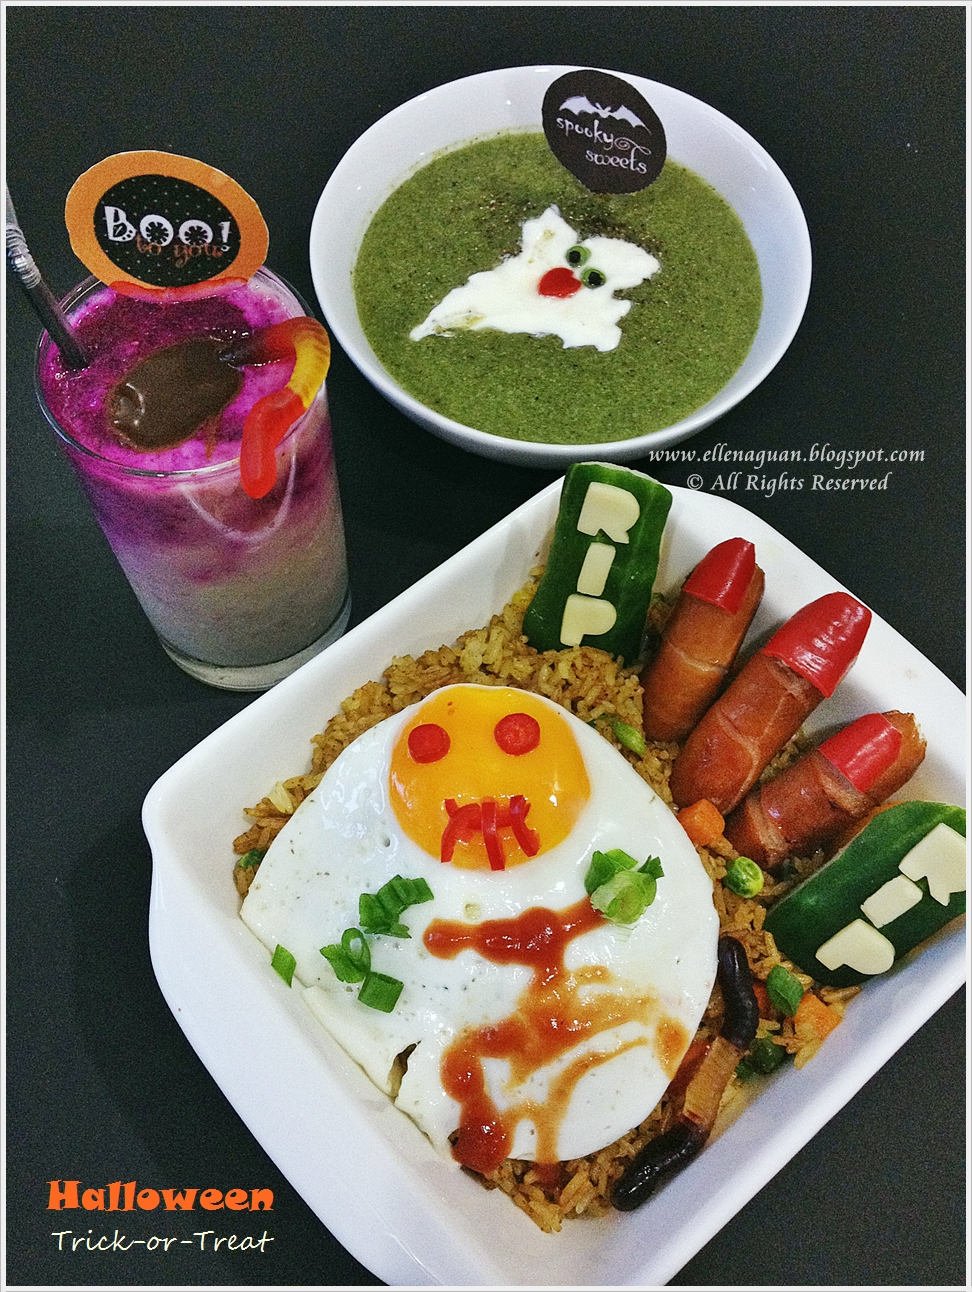 Cuisine Paradise | Singapore Food Blog | Recipes, Reviews And ...